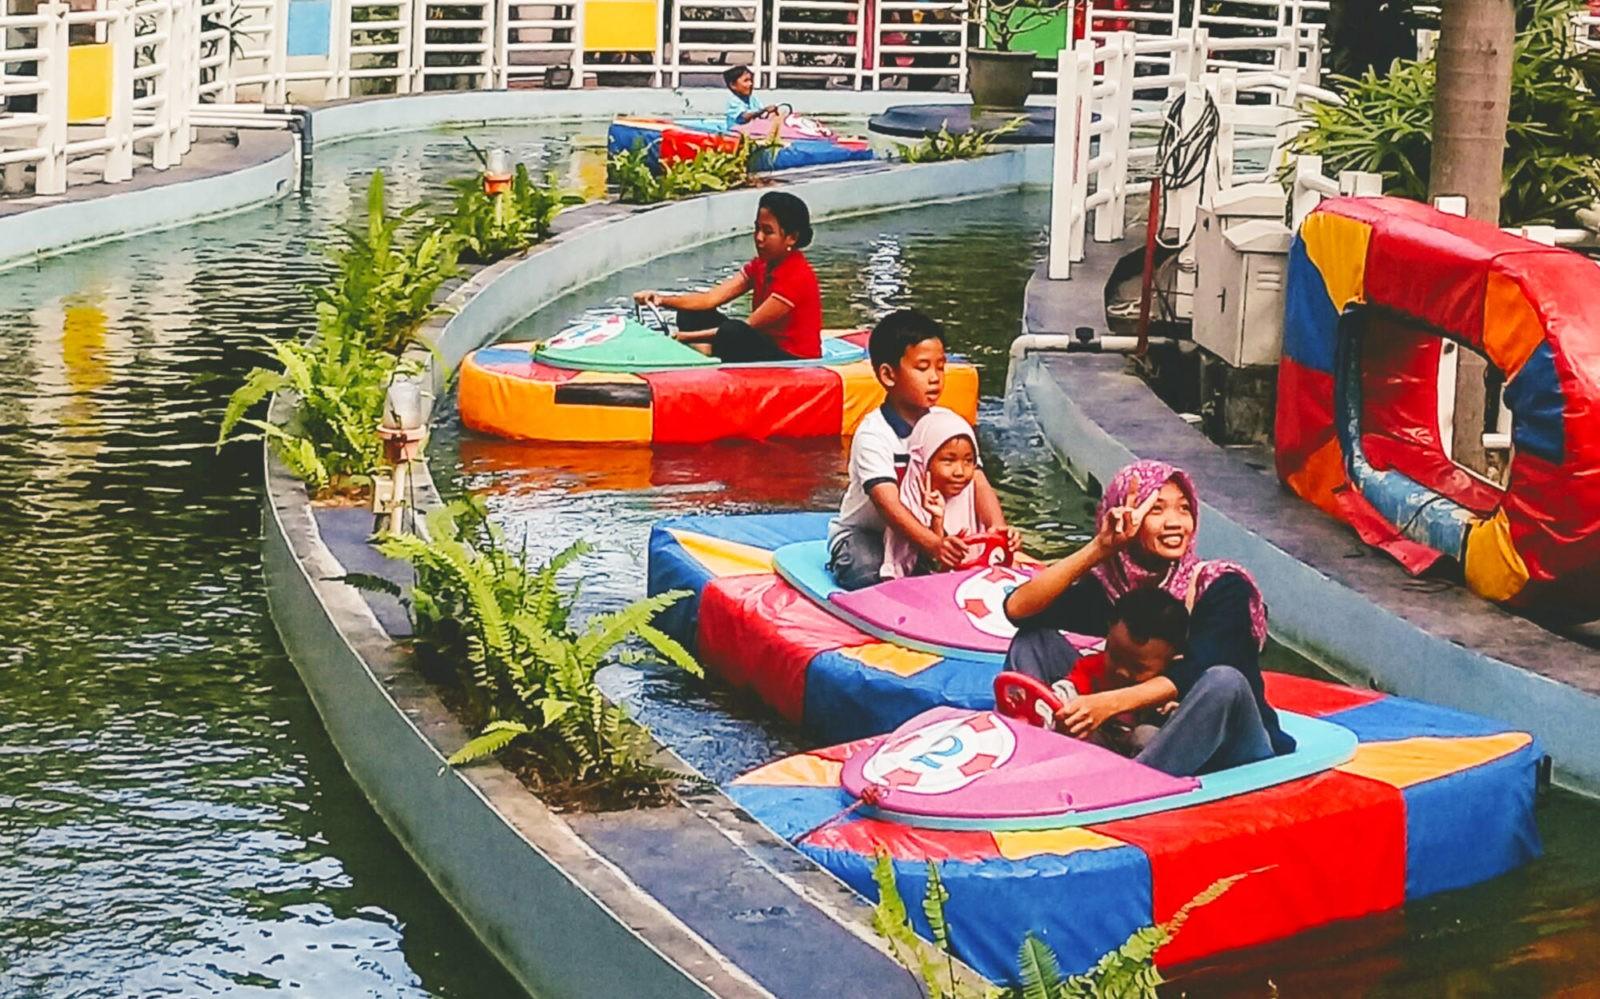 wisata perahu di jogja TAMAN PINTAR Yogyakarta Tiket Wahana Desember 2019